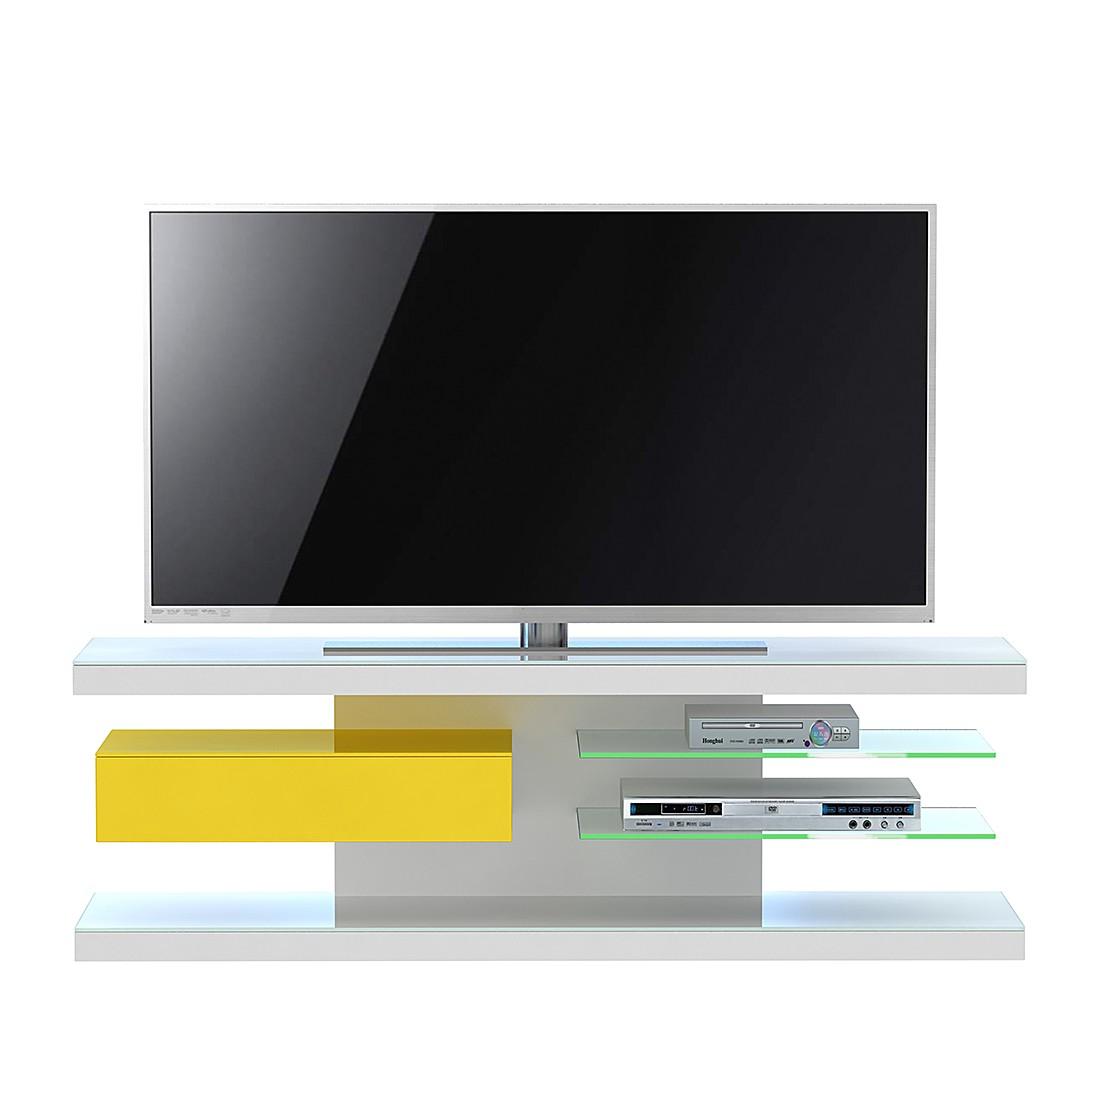 home24 TV-Rack SL 660 | Wohnzimmer > TV-HiFi-Möbel > TV-Raks | Weiss | Glas - Metall - Holz | Jahnke